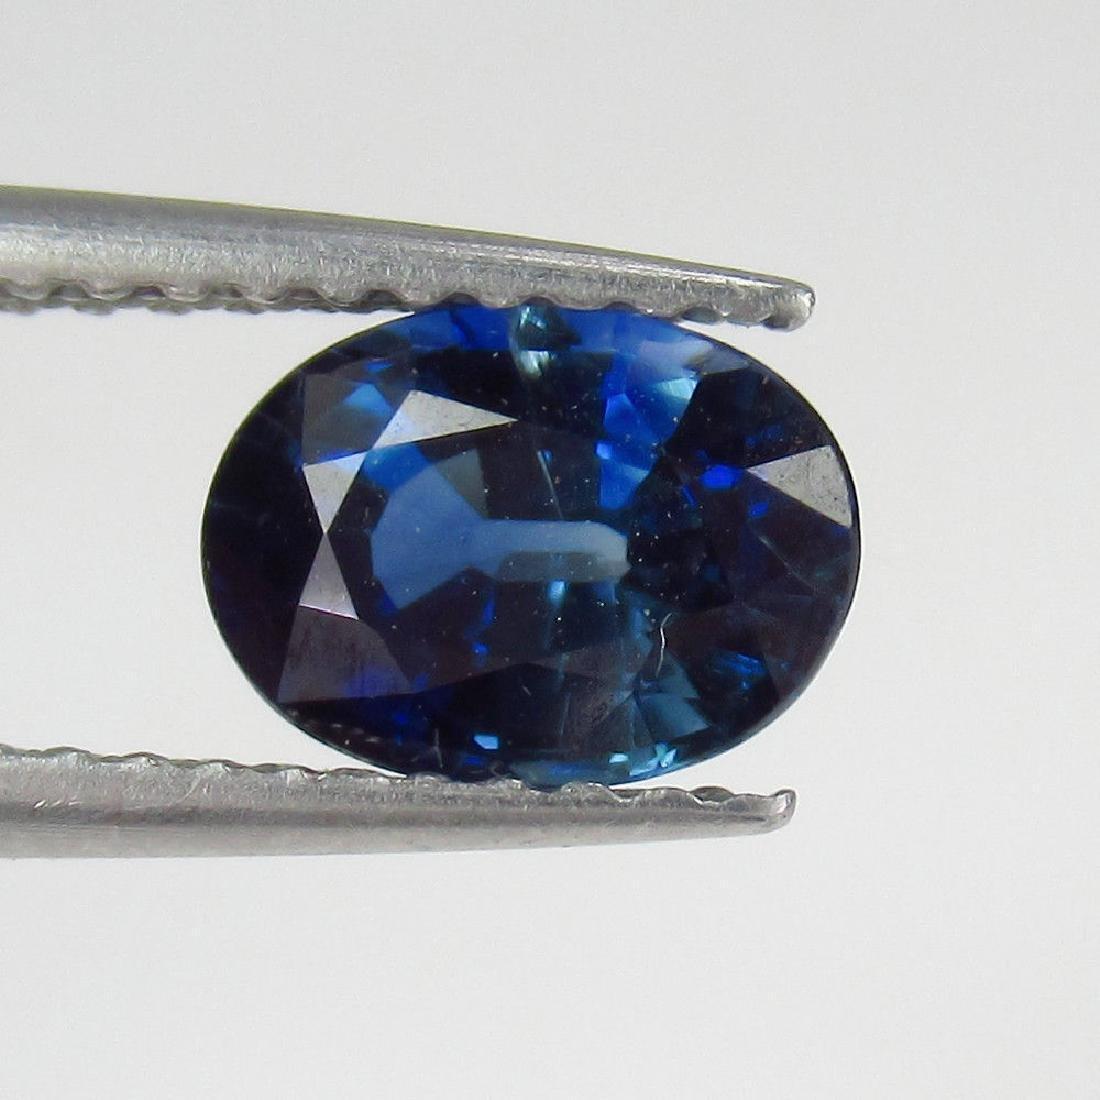 1.23 Ct Genuine Loose Ceylon Blue Sapphire Nice Oval